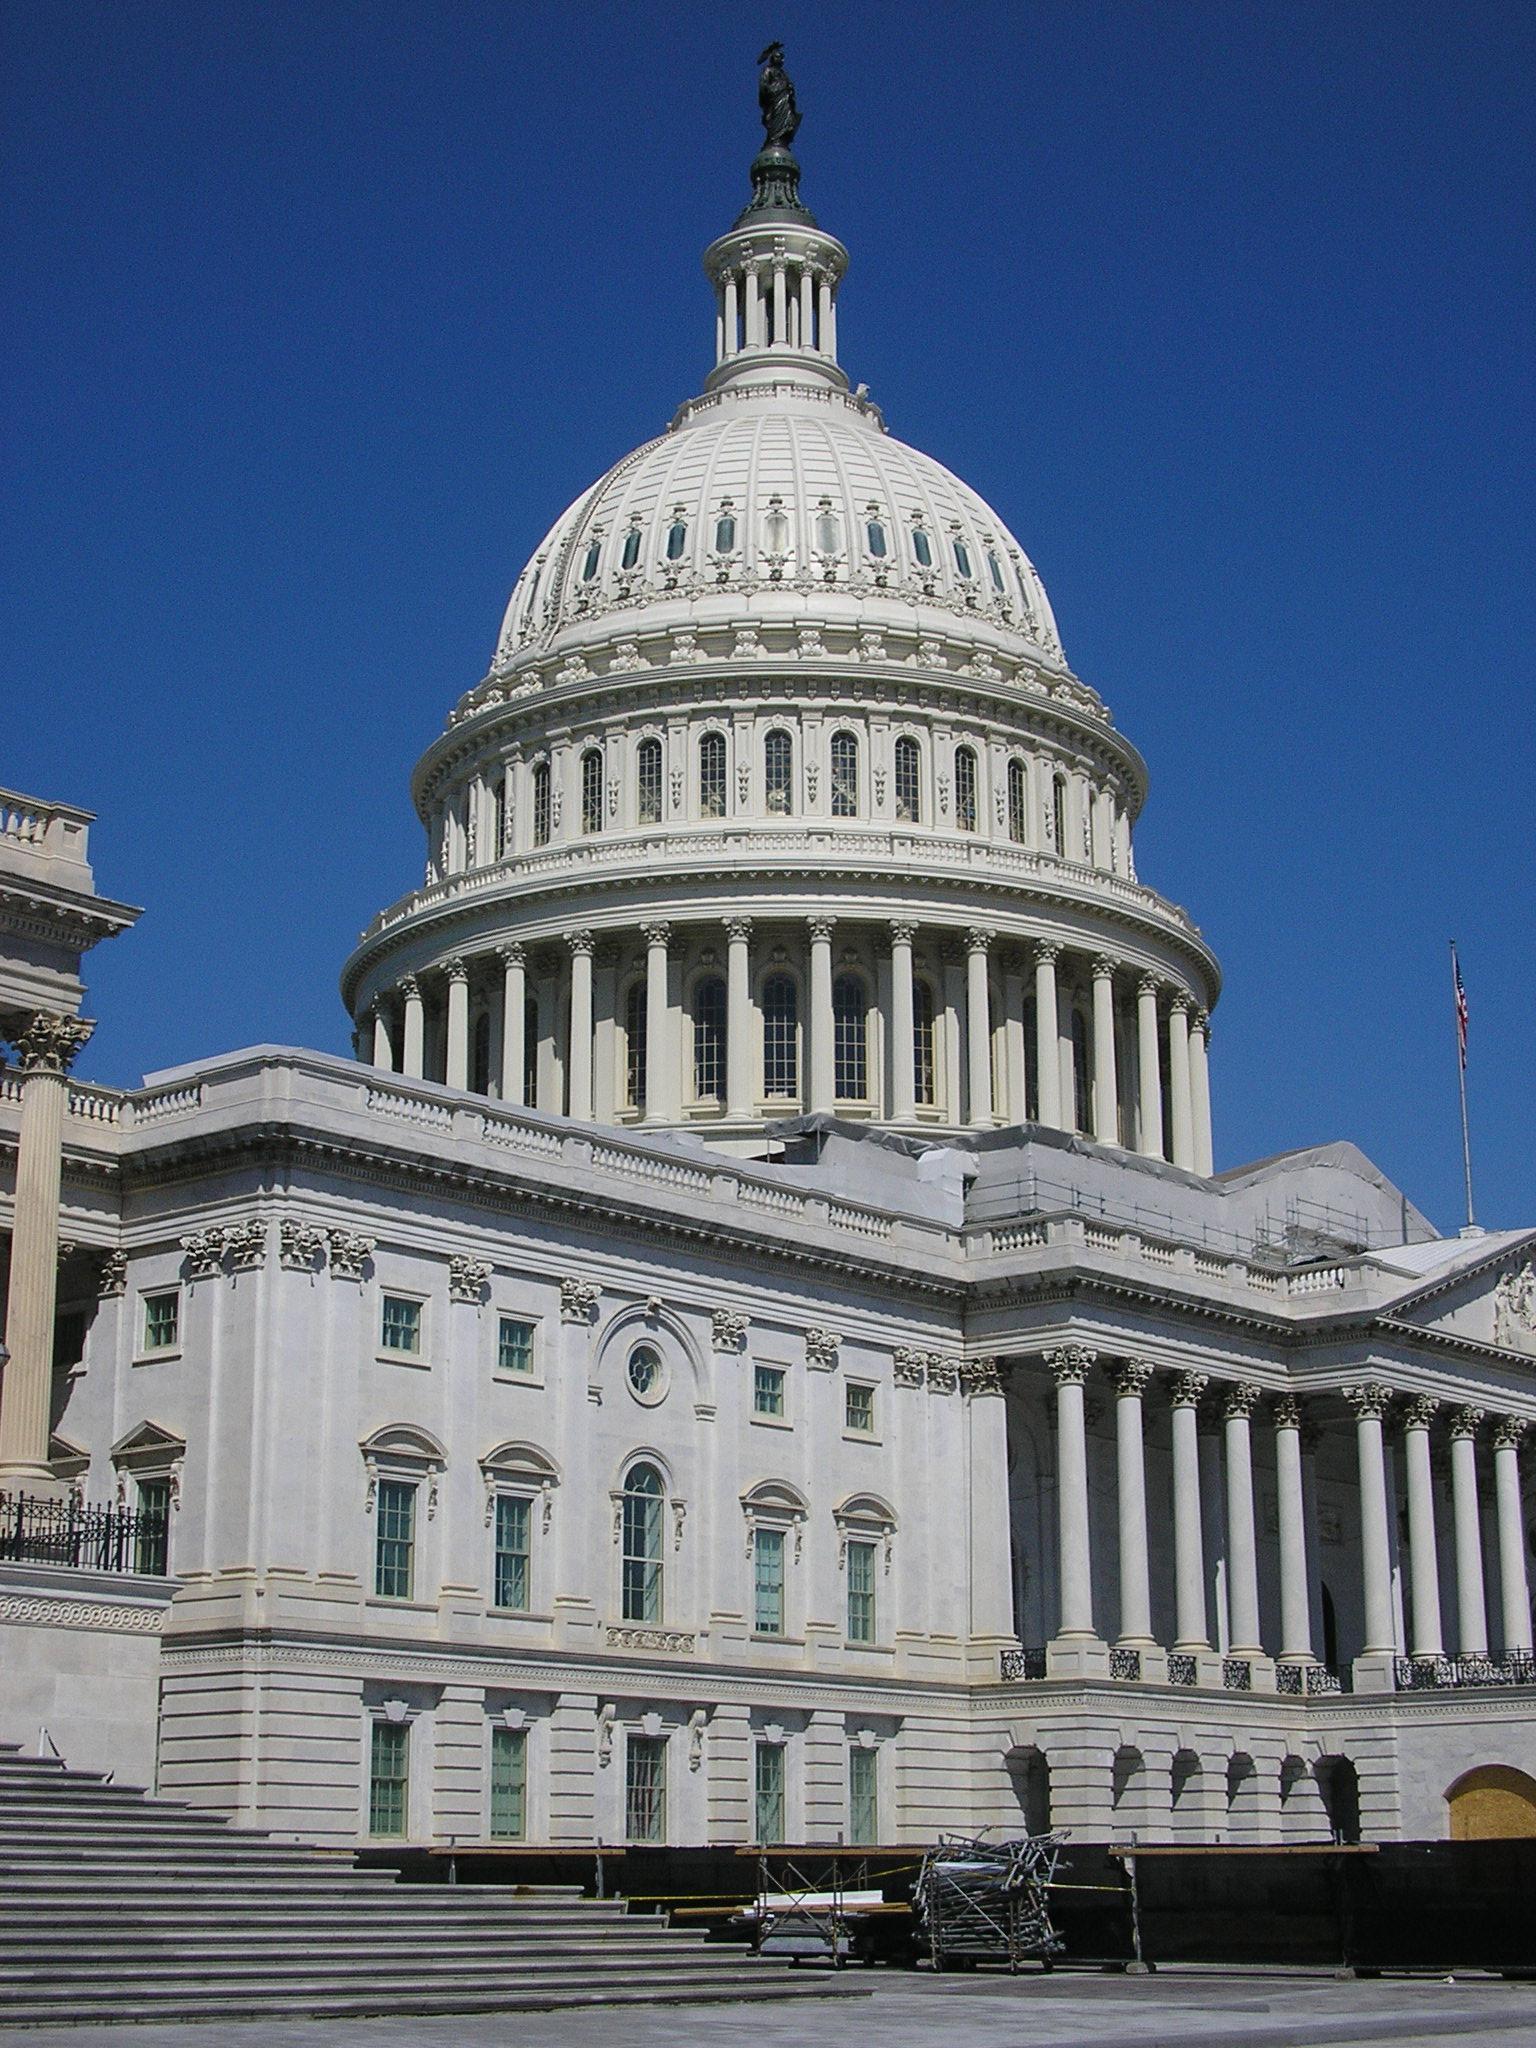 File:Washington 05 183.jpg - Wikimedia Commons